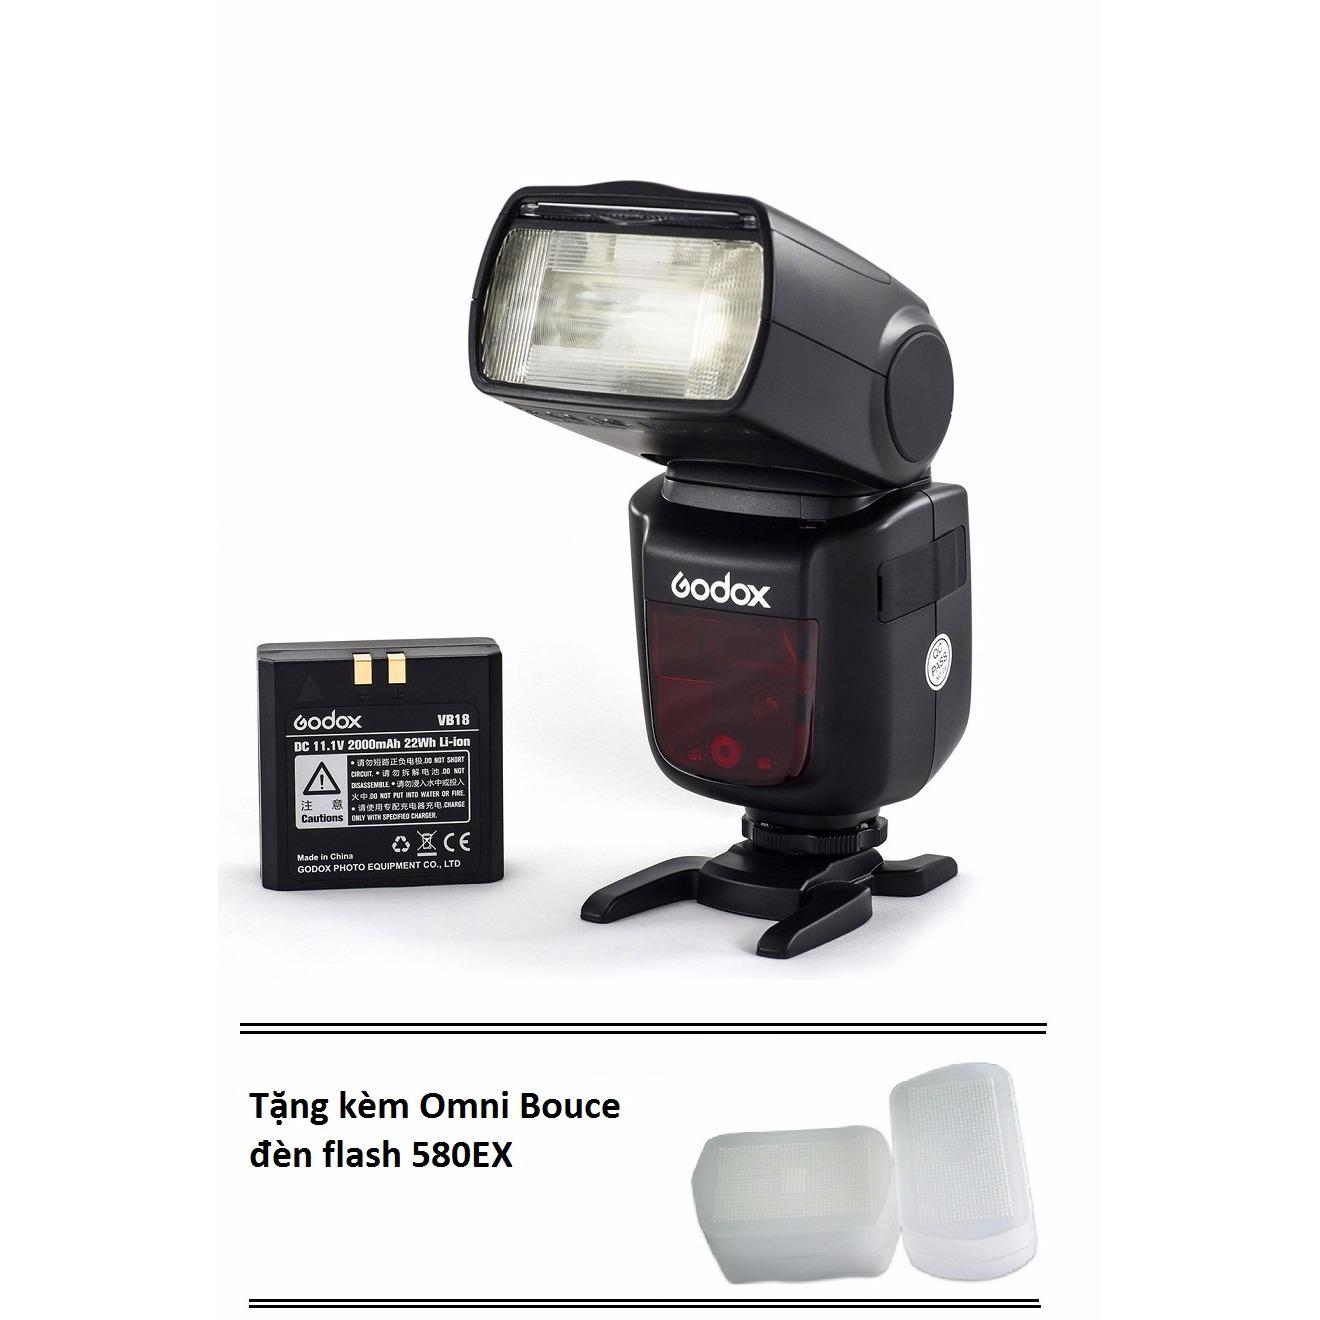 Cửa Hàng Flash Godox Li Ion Ving V860Ii For Nikon Kem Pin Sạc Tặng Kem 1 Omni Bounce Flash Đen Trực Tuyến